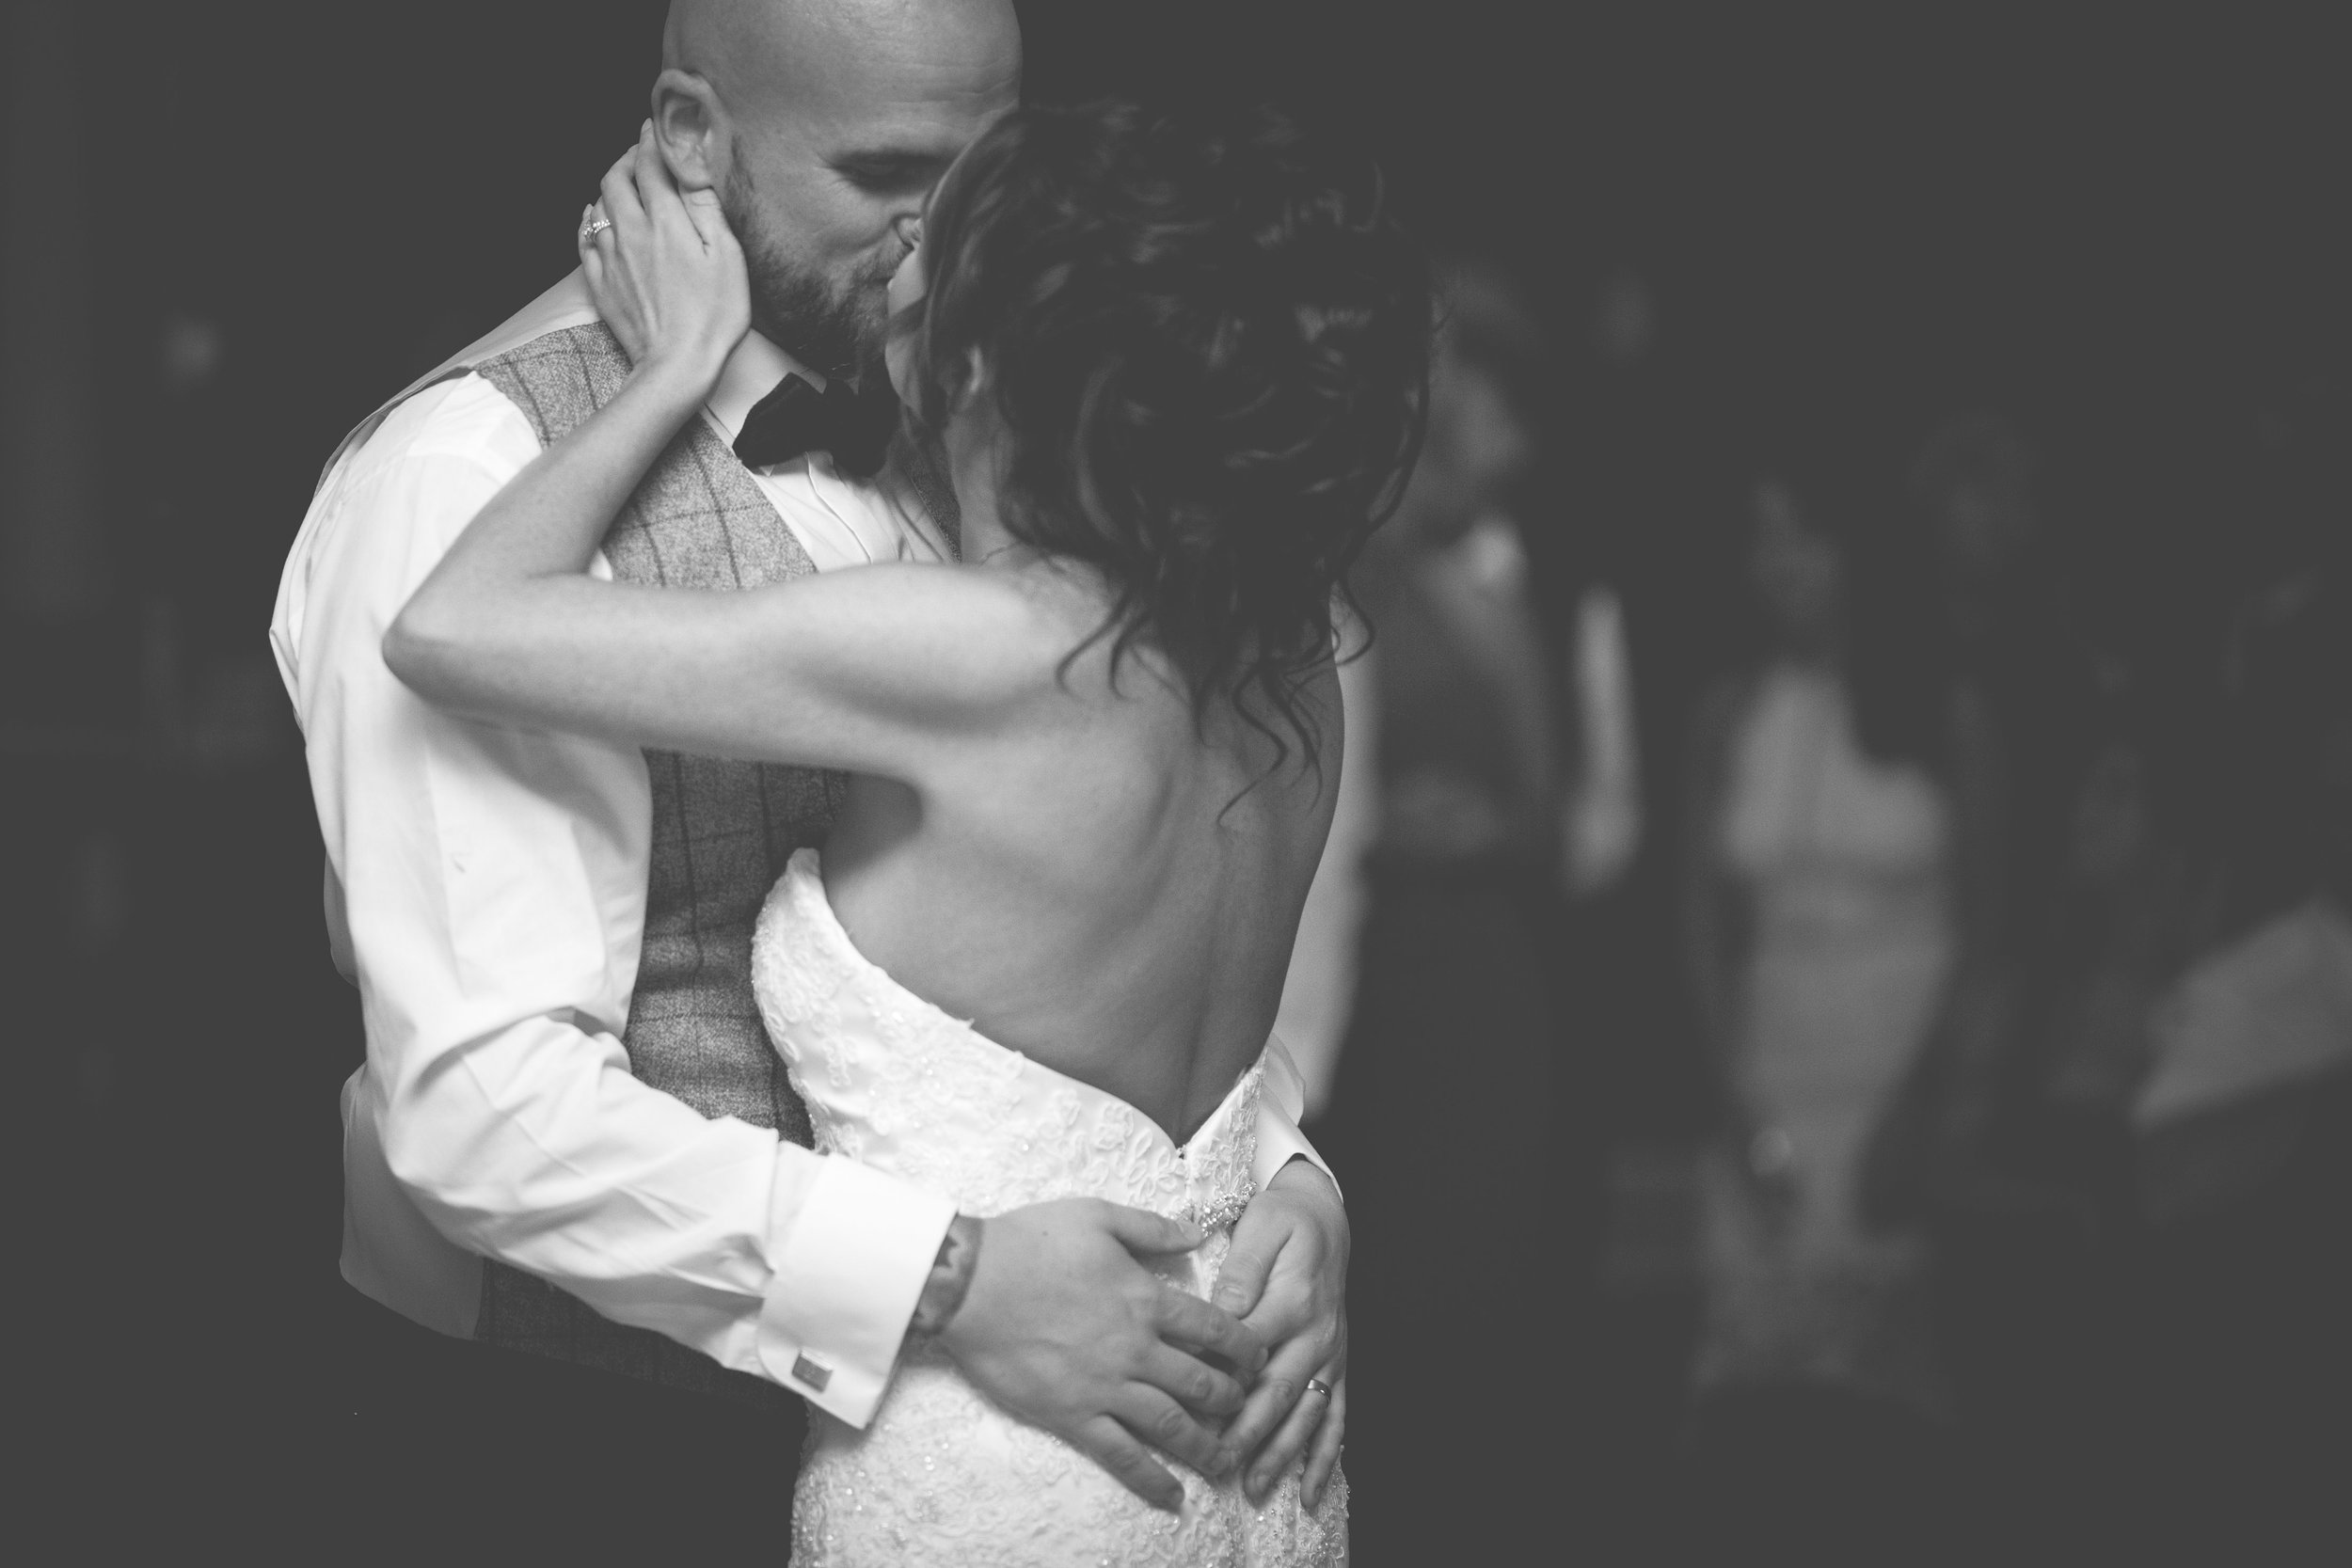 Northern Ireland Wedding Photographer | Brian McEwan Photography | Affordable Wedding Photography Throughout Antrim Down Armagh Tyrone Londonderry Derry Down Fermanagh -46.jpg